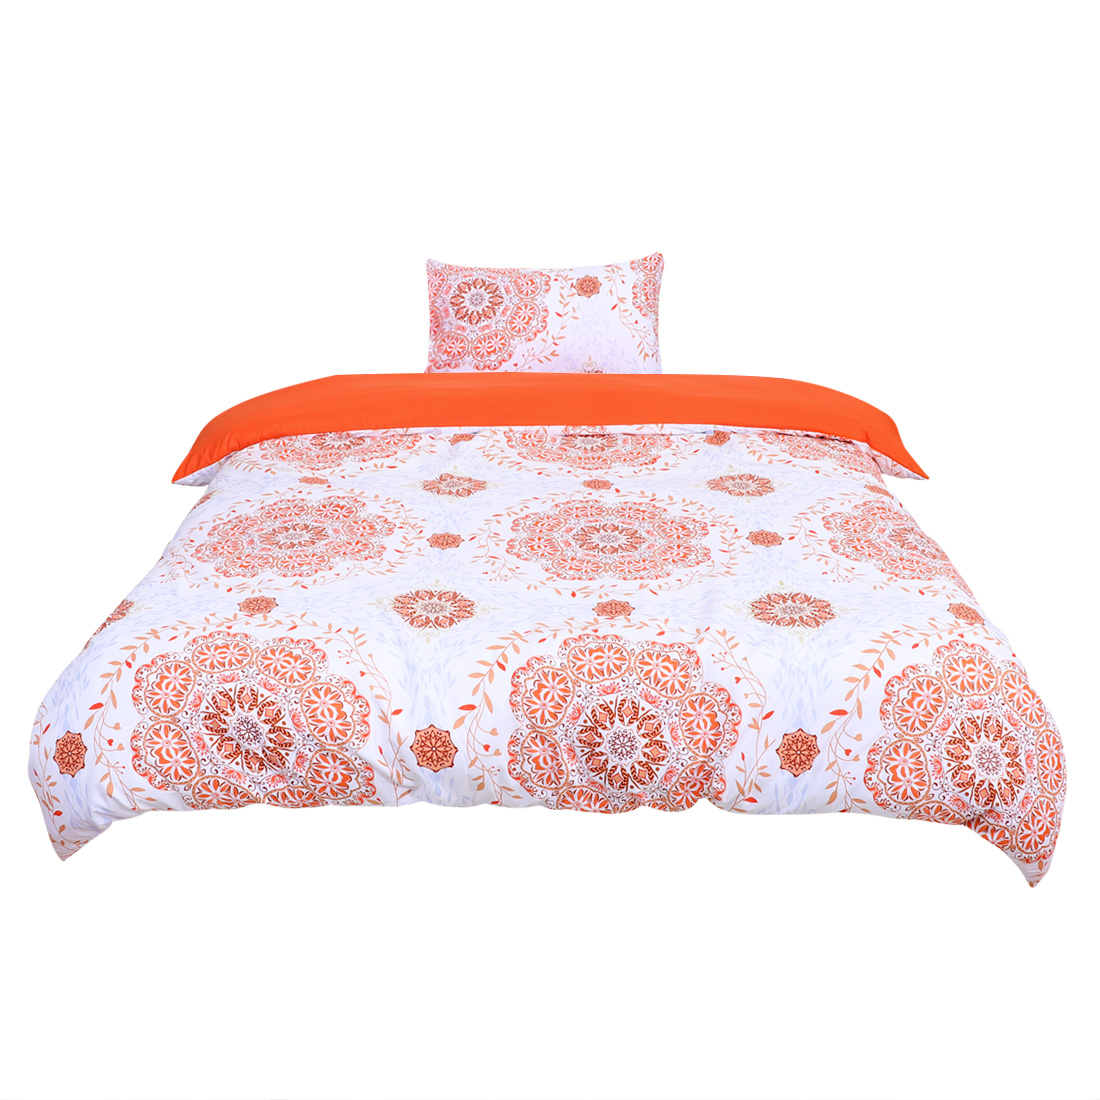 Twin All-season Duvet Cover Sets Bohemian Orange, with 1 Pillow Case